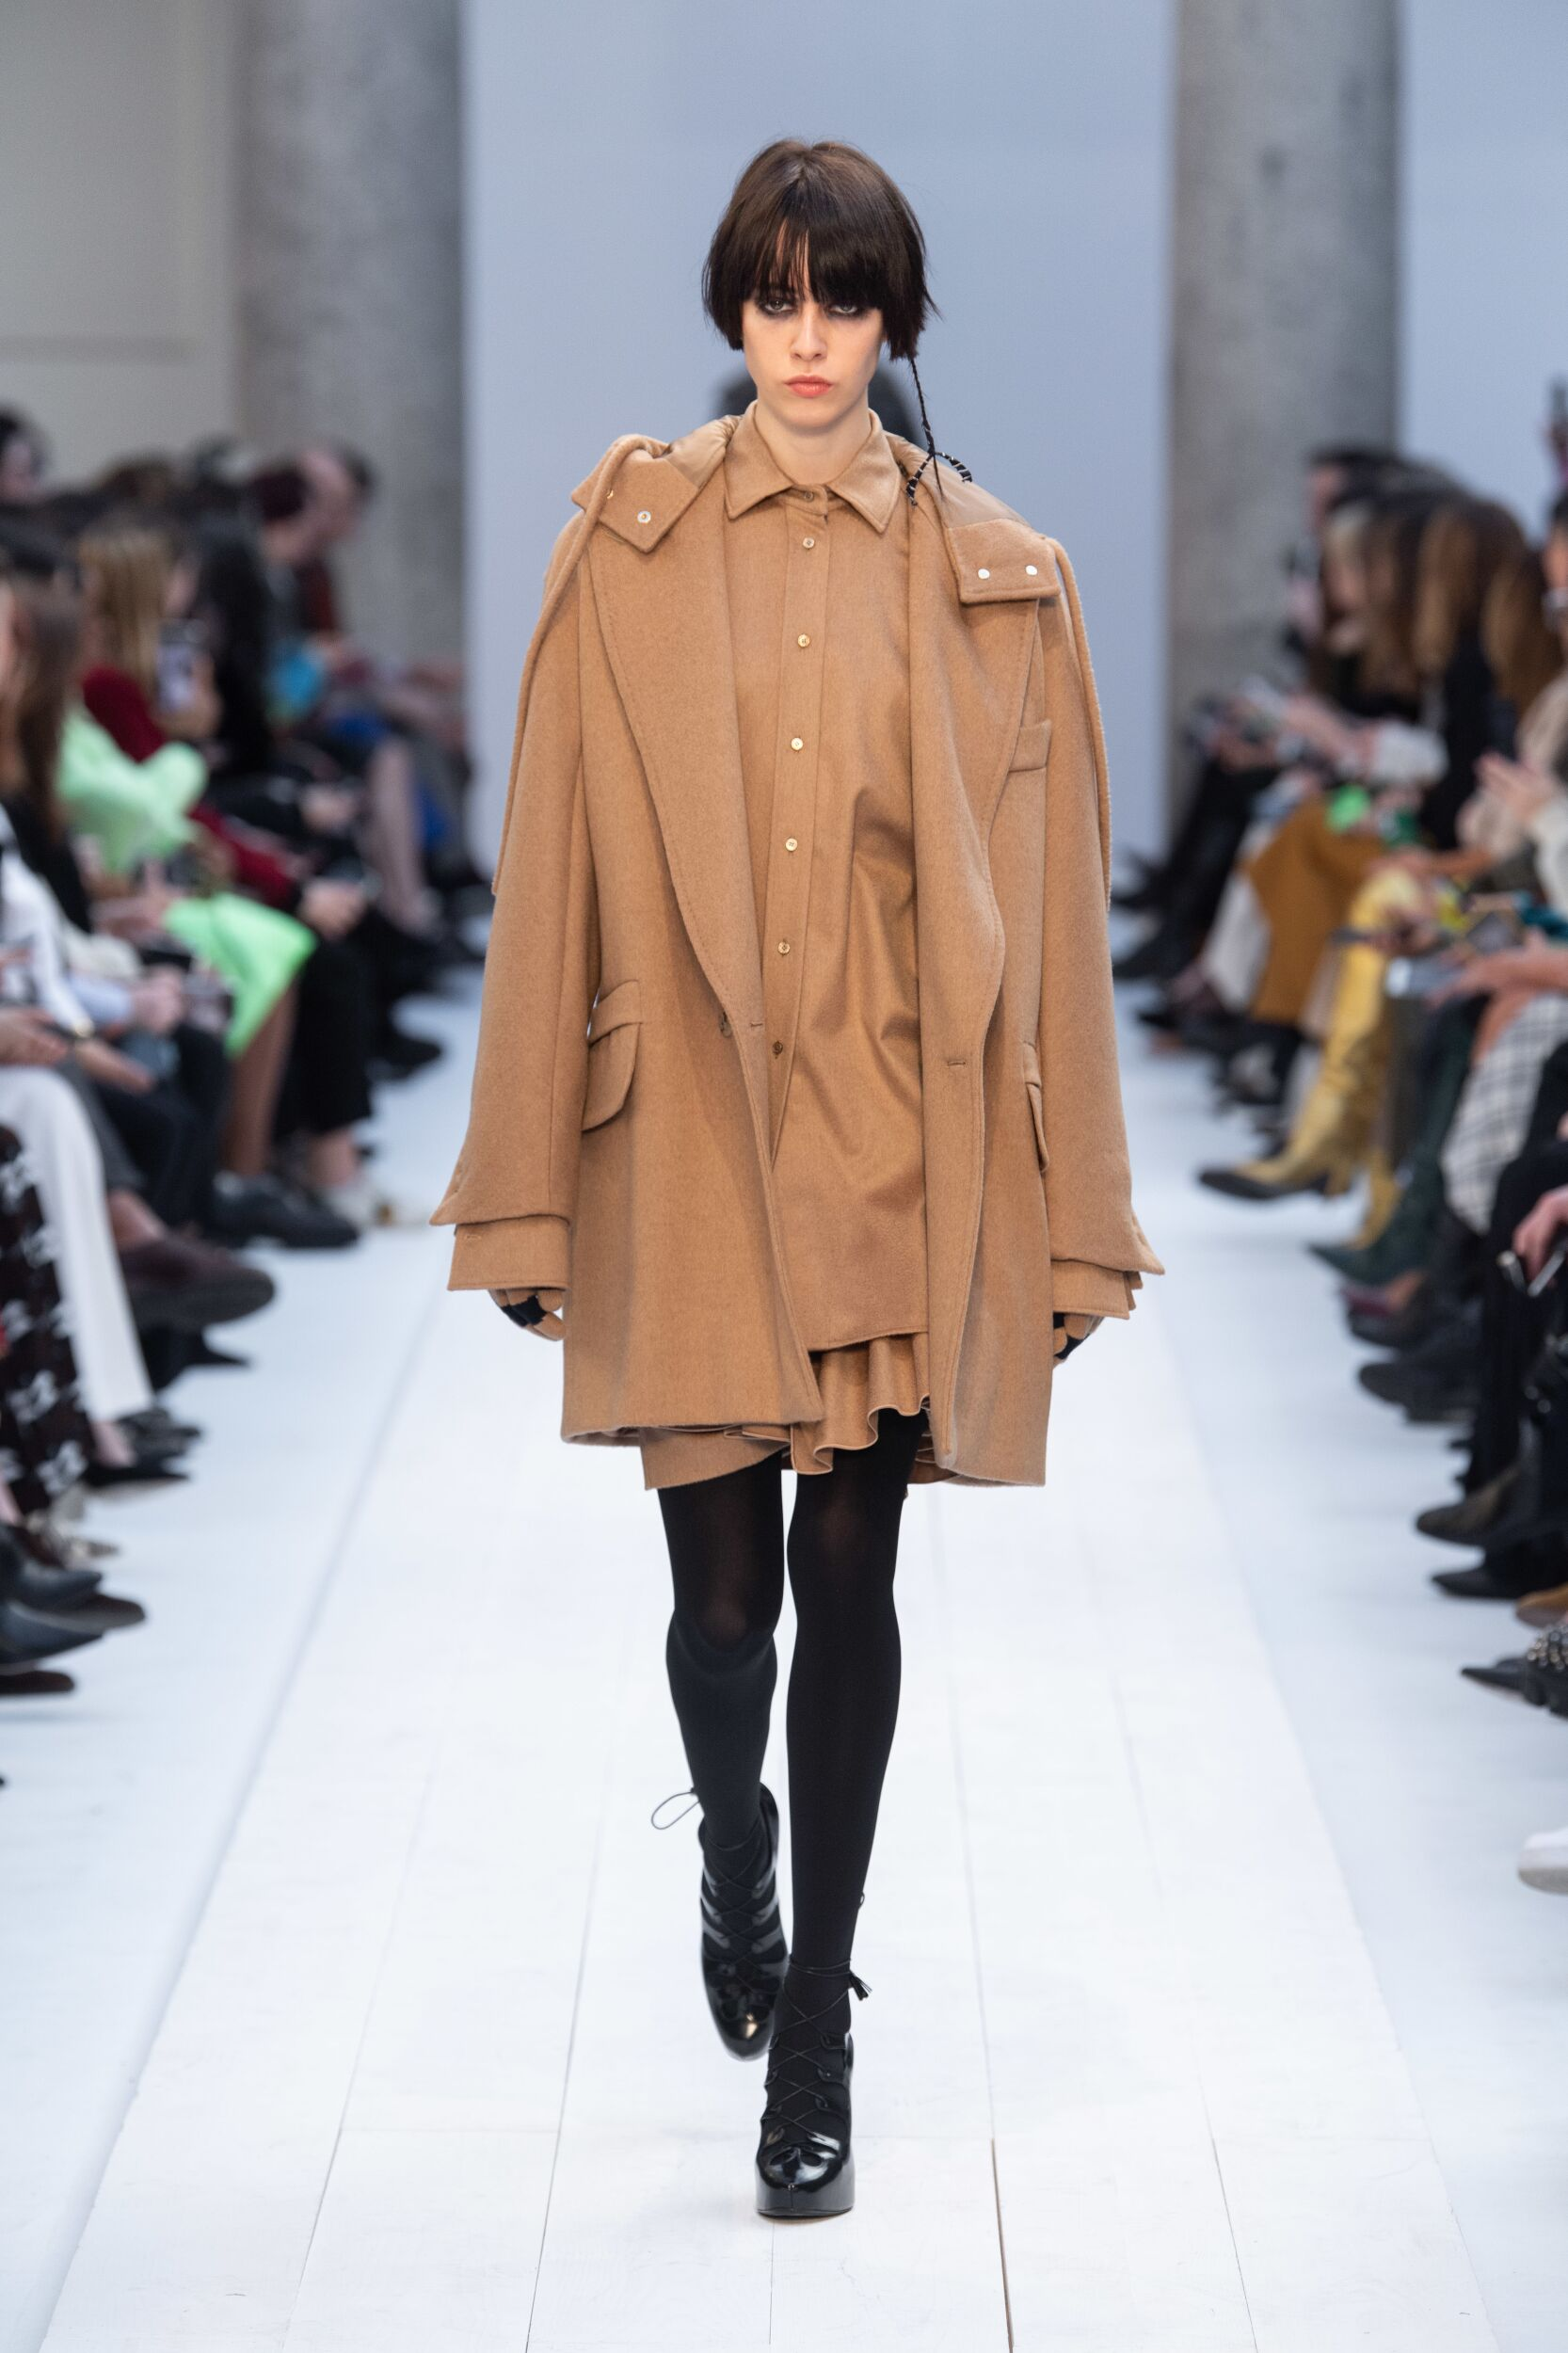 Runway Max Mara Fall Winter 2020 Women's Collection Milan Fashion Week